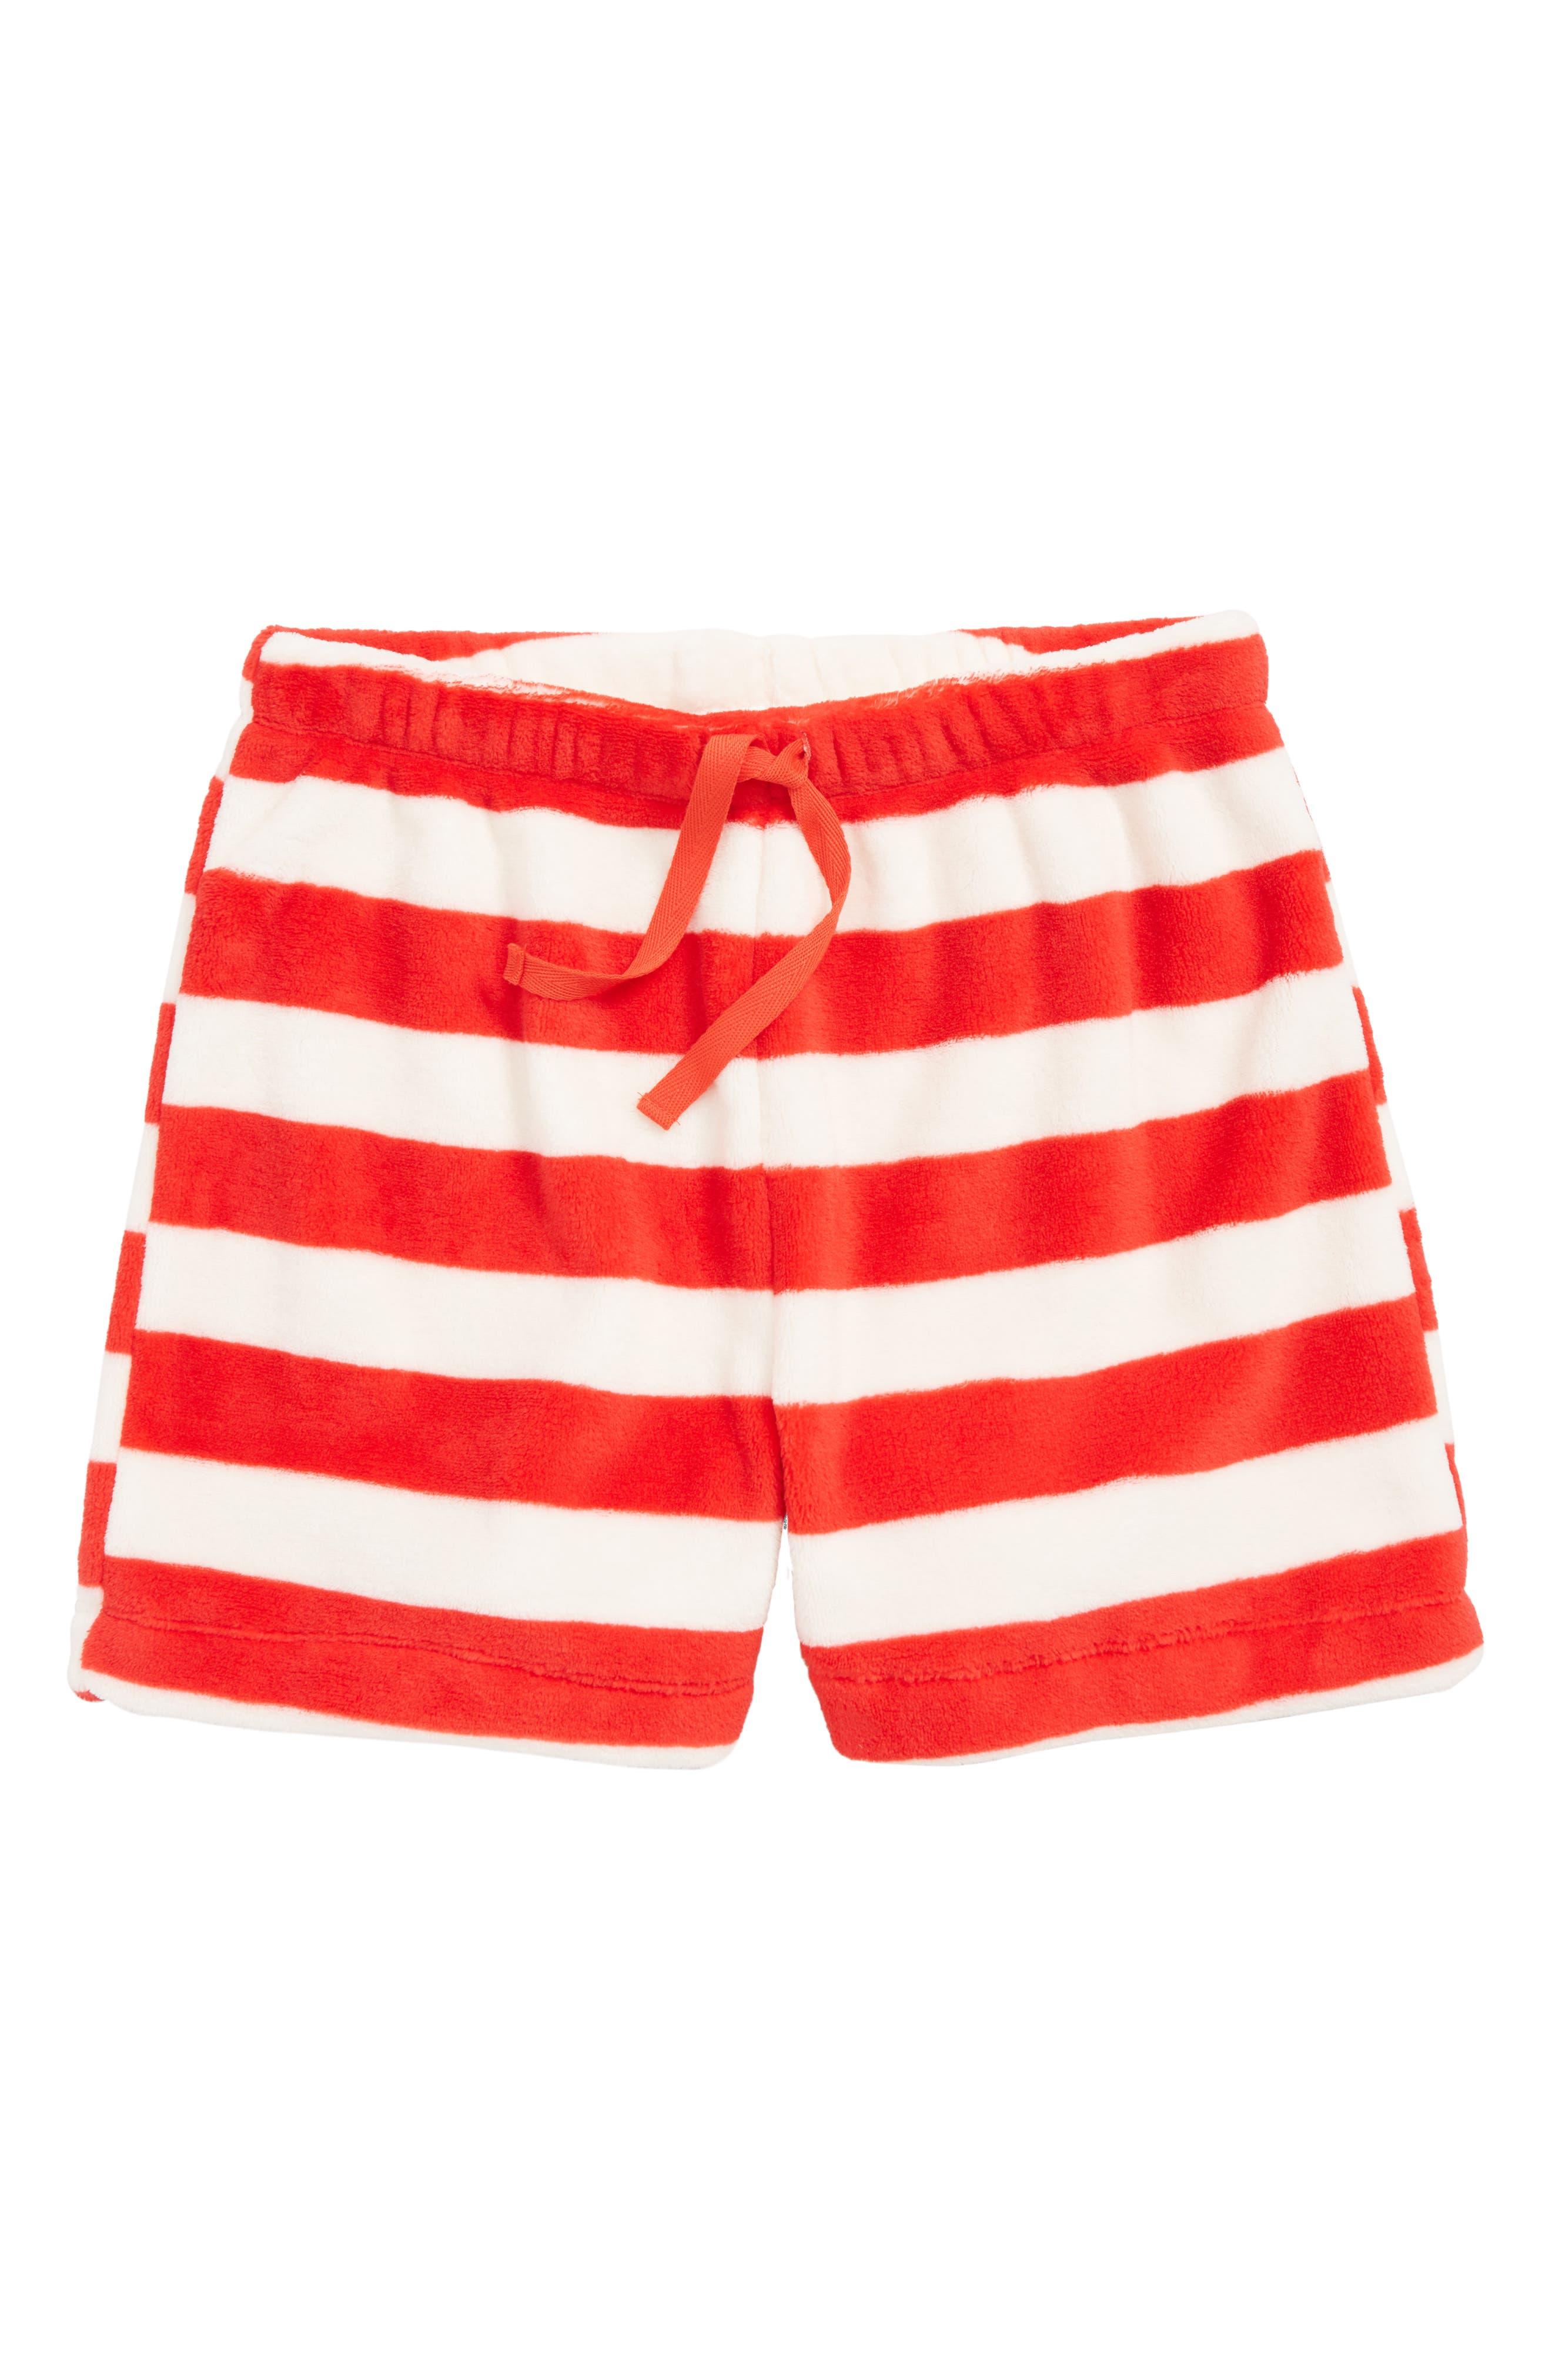 Girls Tucker  Tate Fleece Sleep Shorts Size M (810)  Red